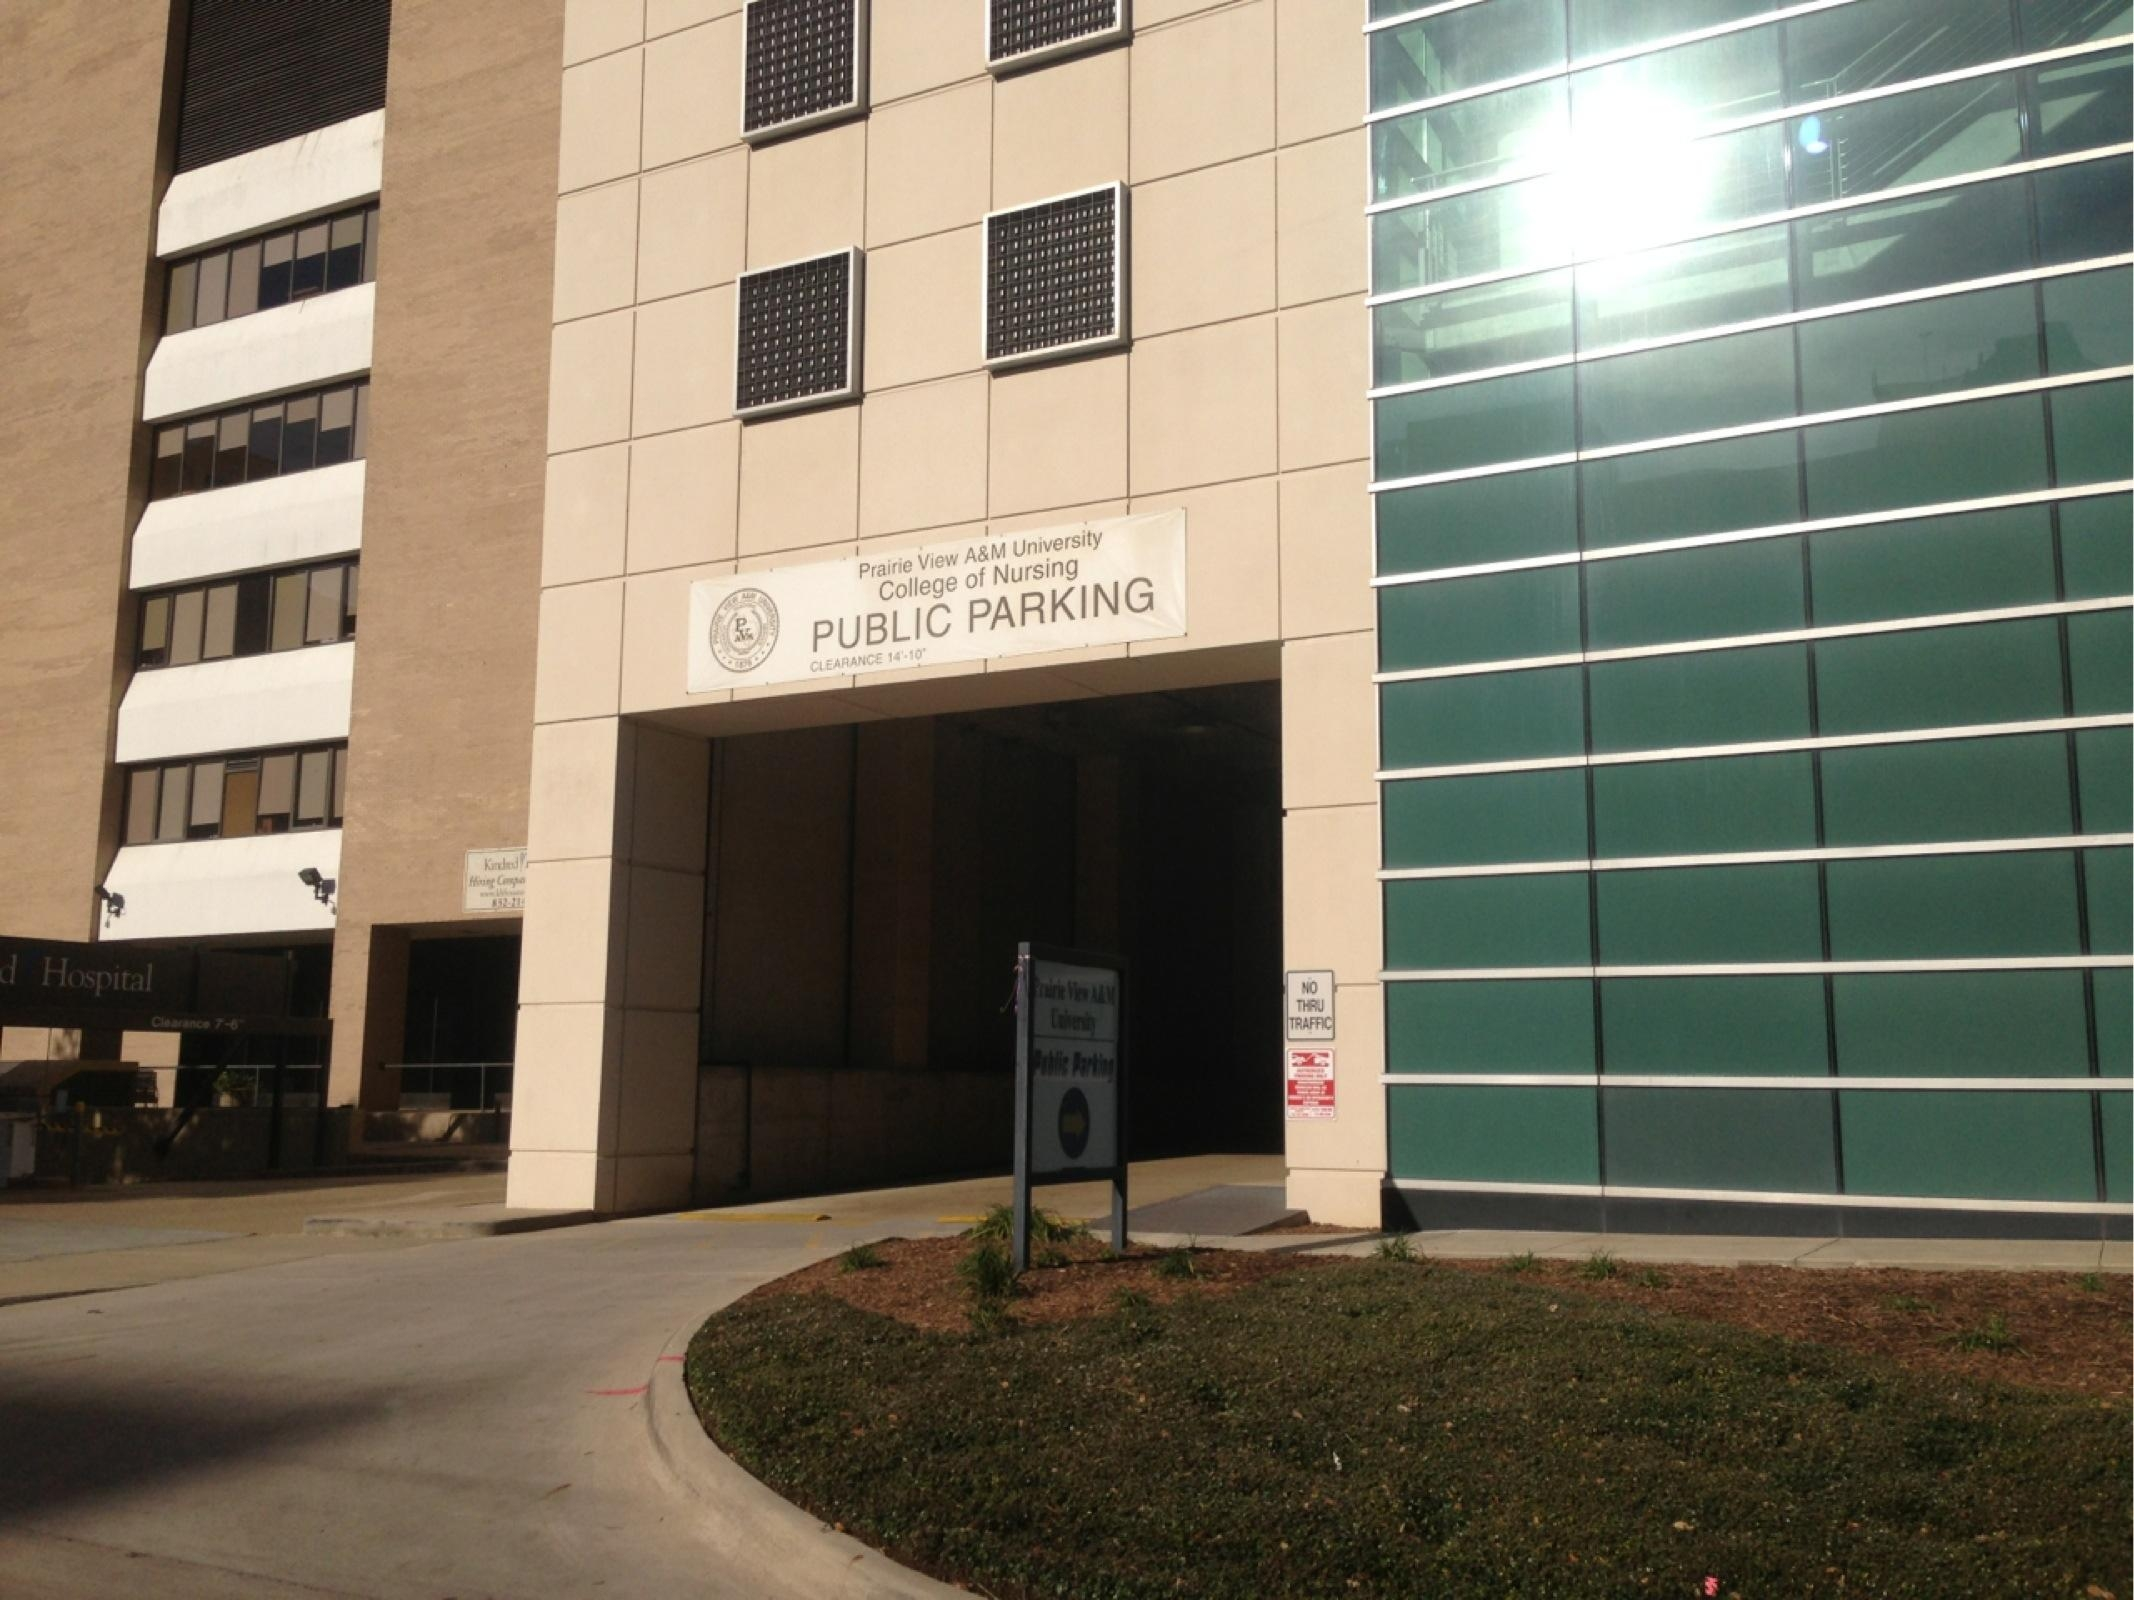 Prairie View Nursing >> The Prairie View A M University College Of Nursing Parking In